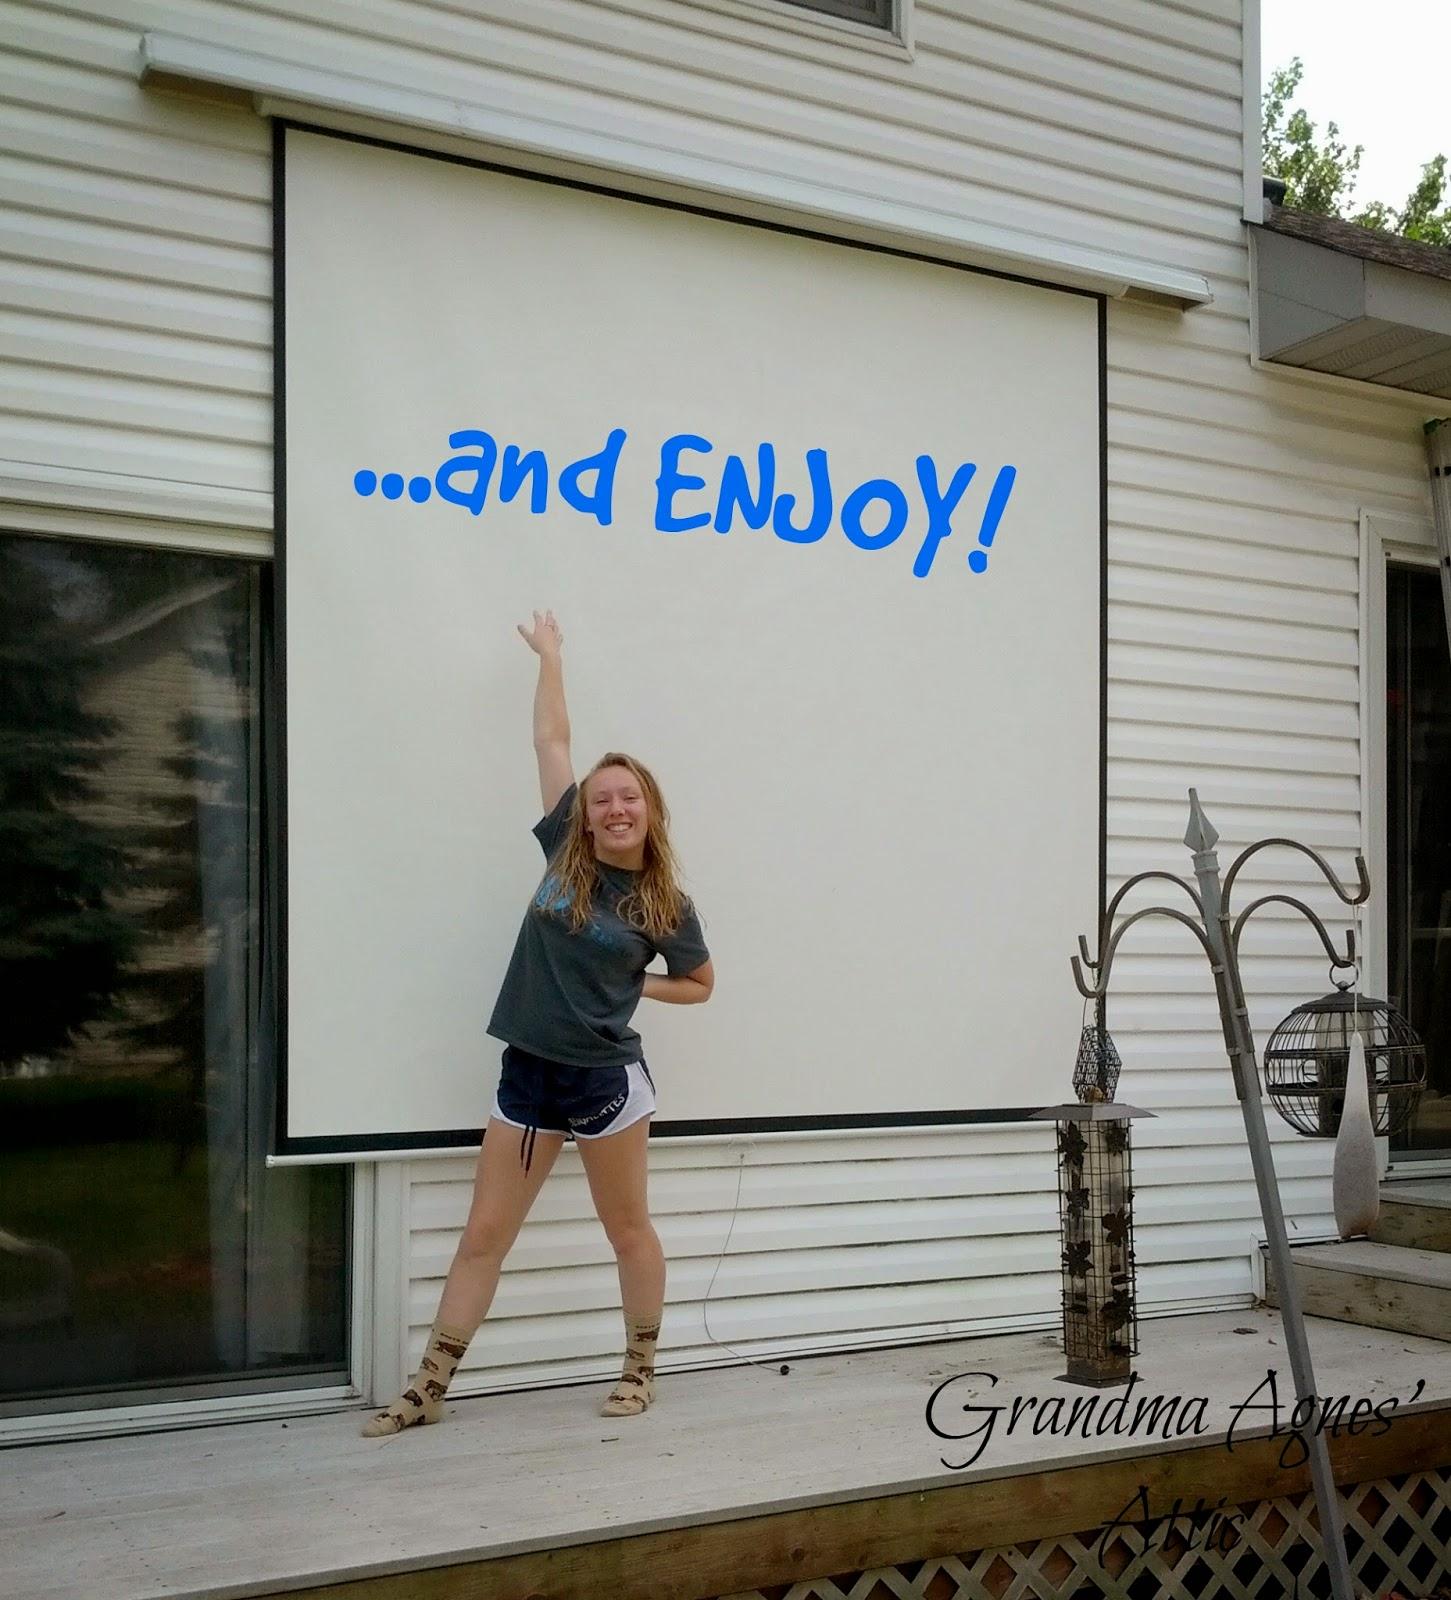 grandma agnes 39 attic outdoor movie screen in your own backyard